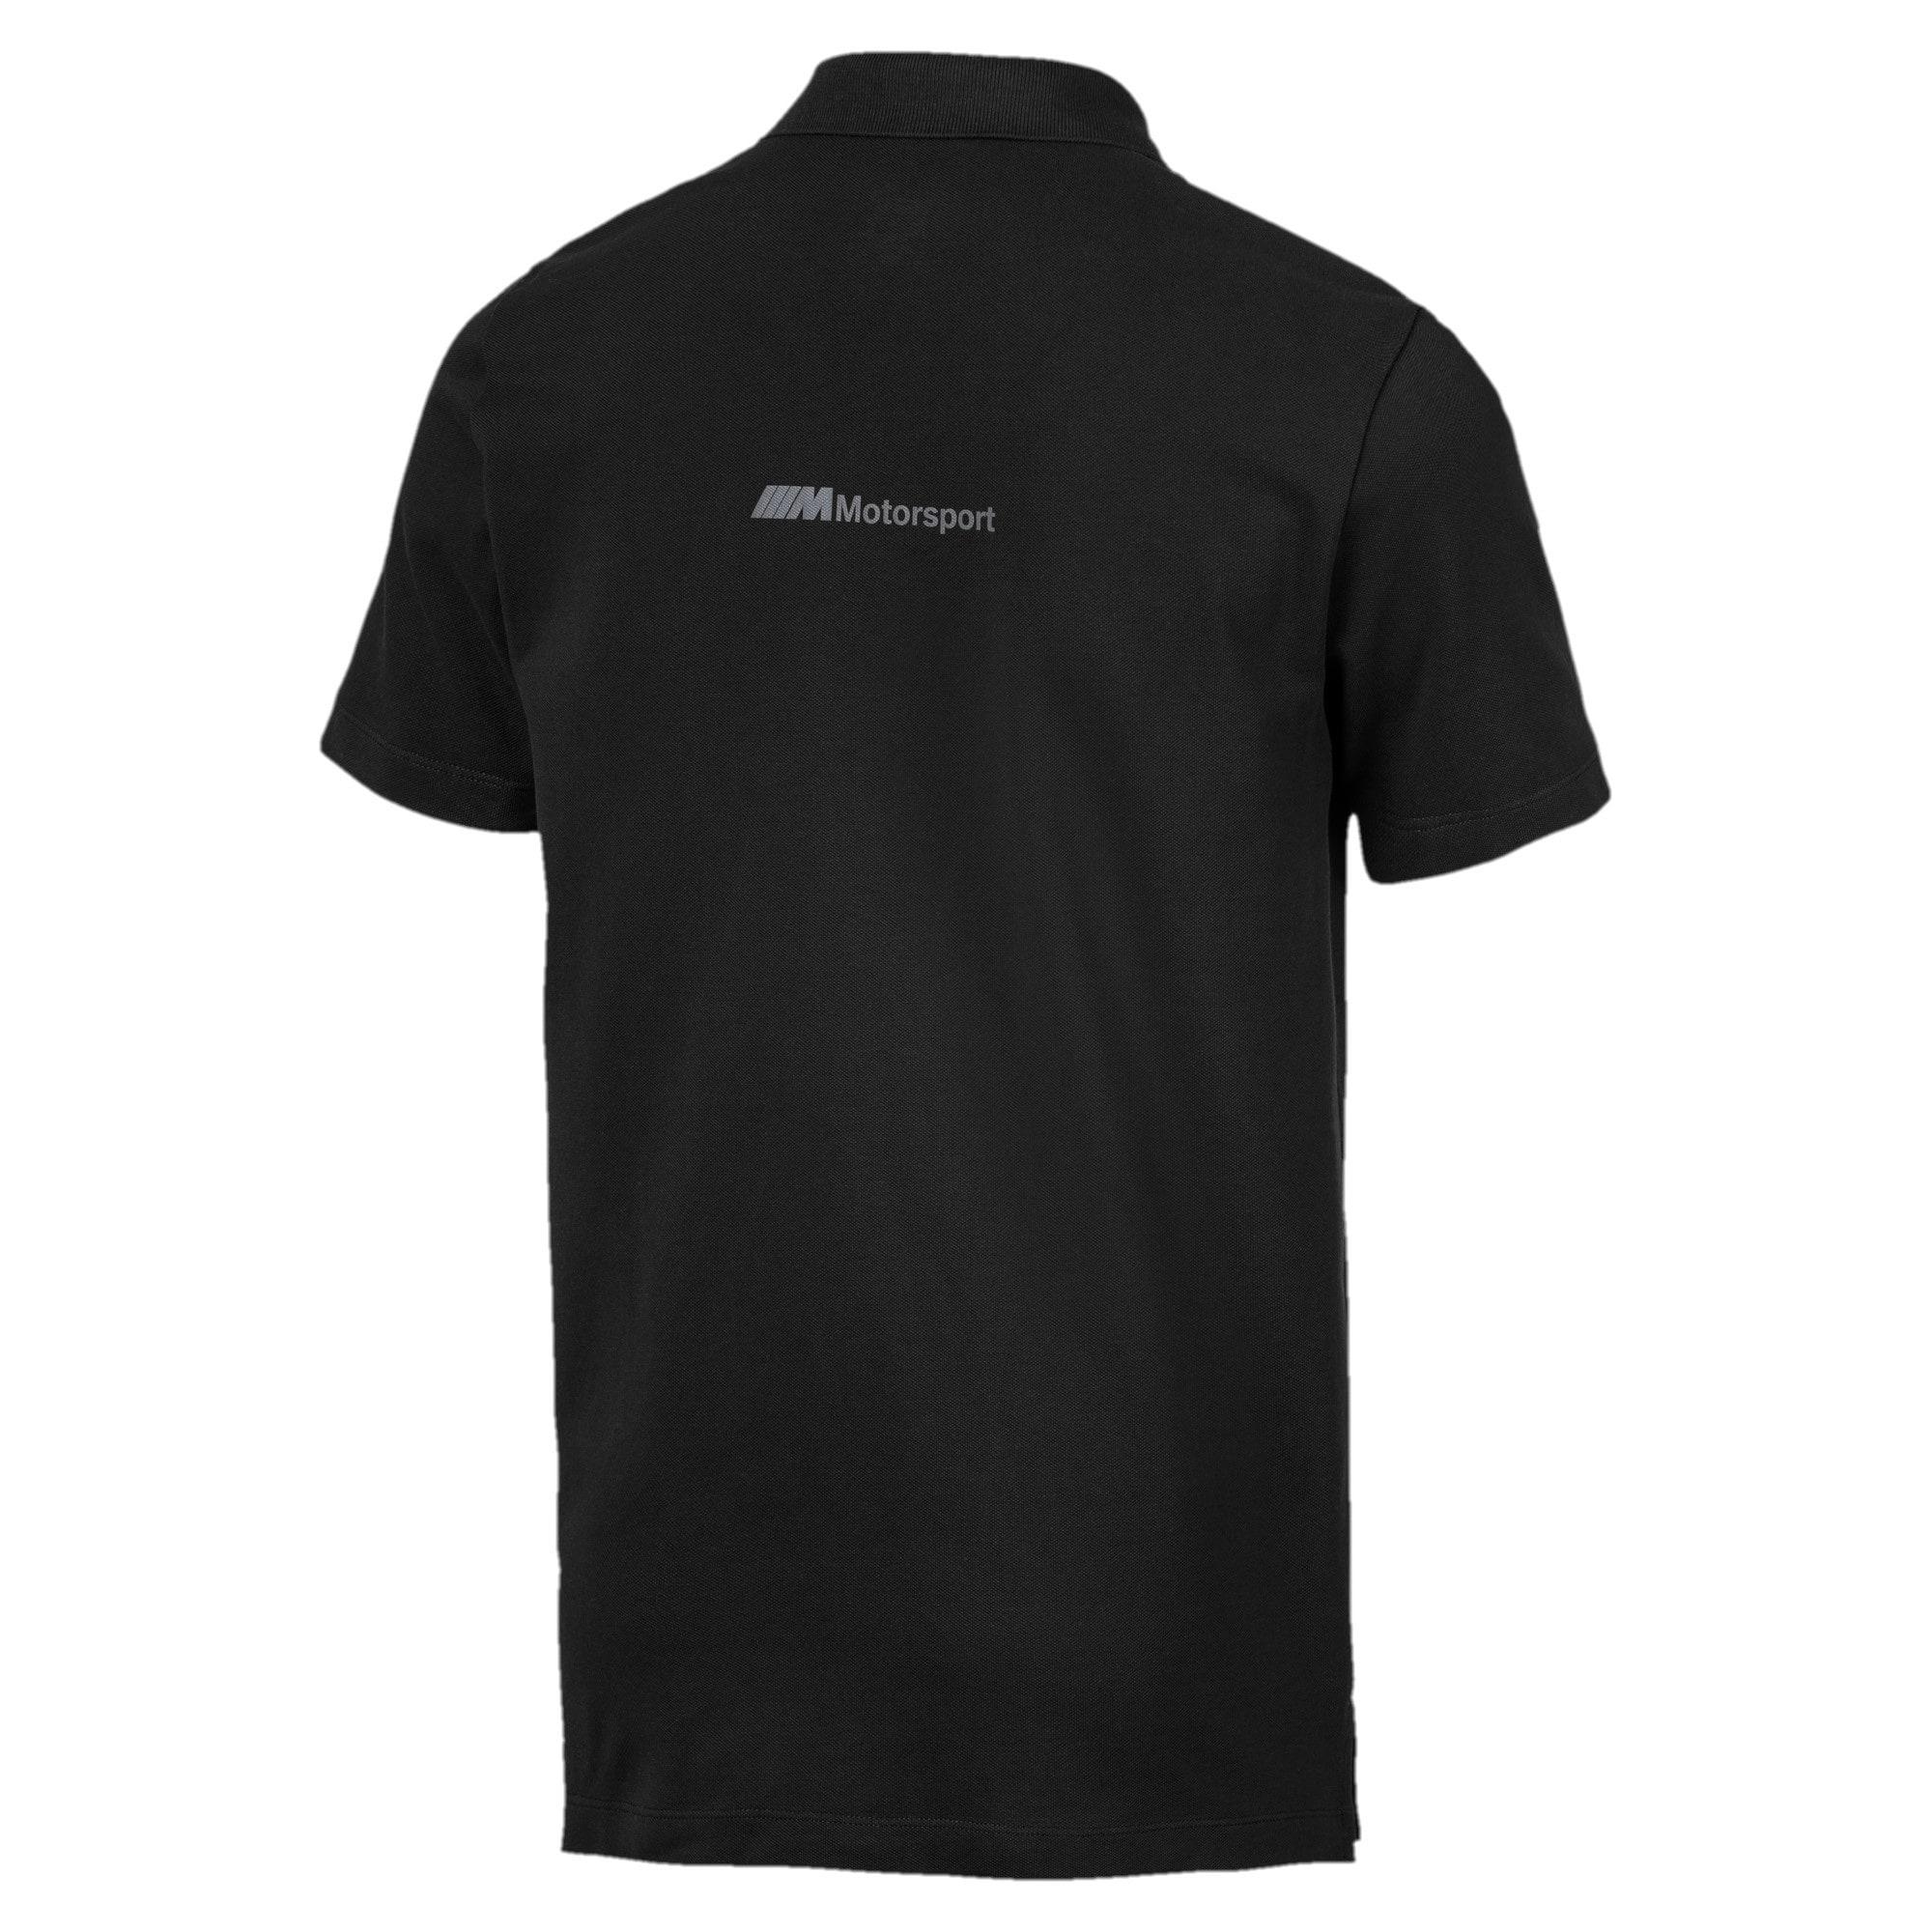 Thumbnail 5 of BMW M Motorsport Life Graphic Men's Polo Shirt, Puma Black, medium